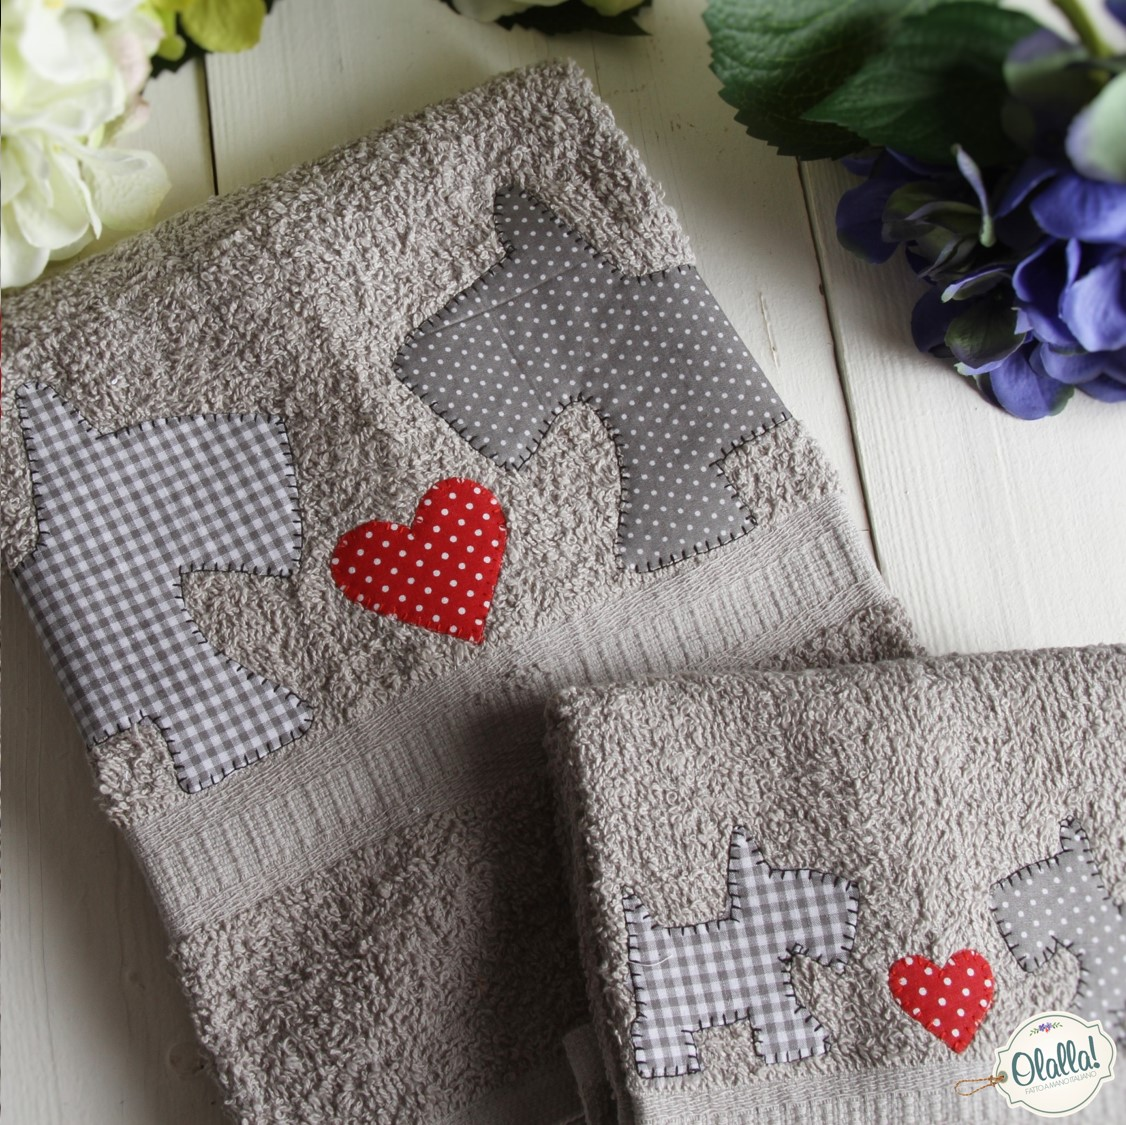 asciugamani-leui-lei-personalizzabili (4)